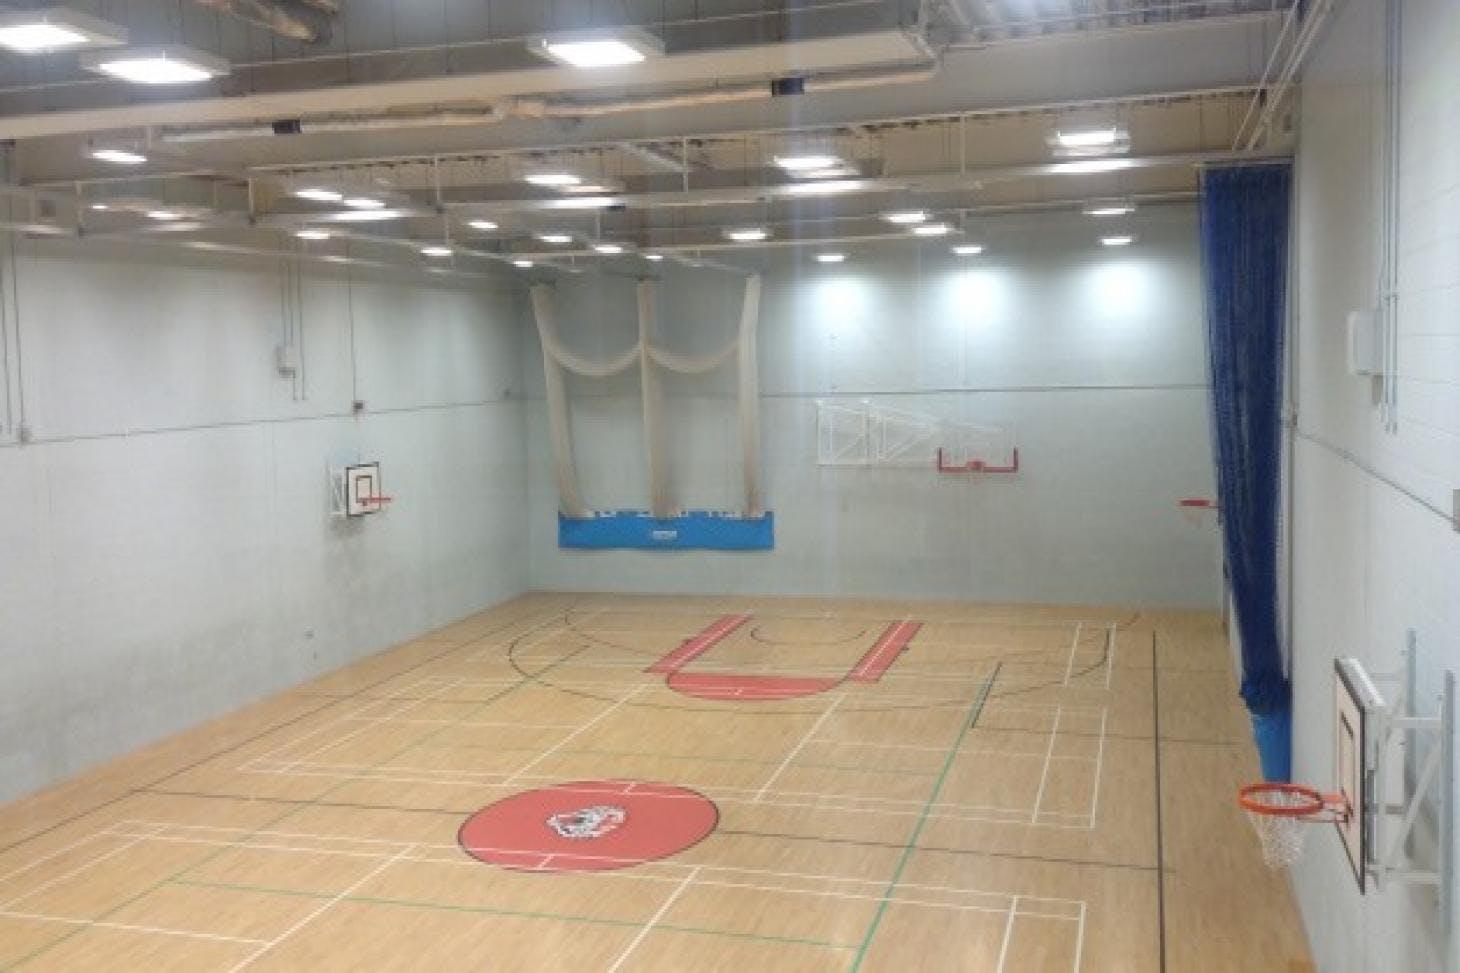 Northfleet Technology College Indoor basketball court